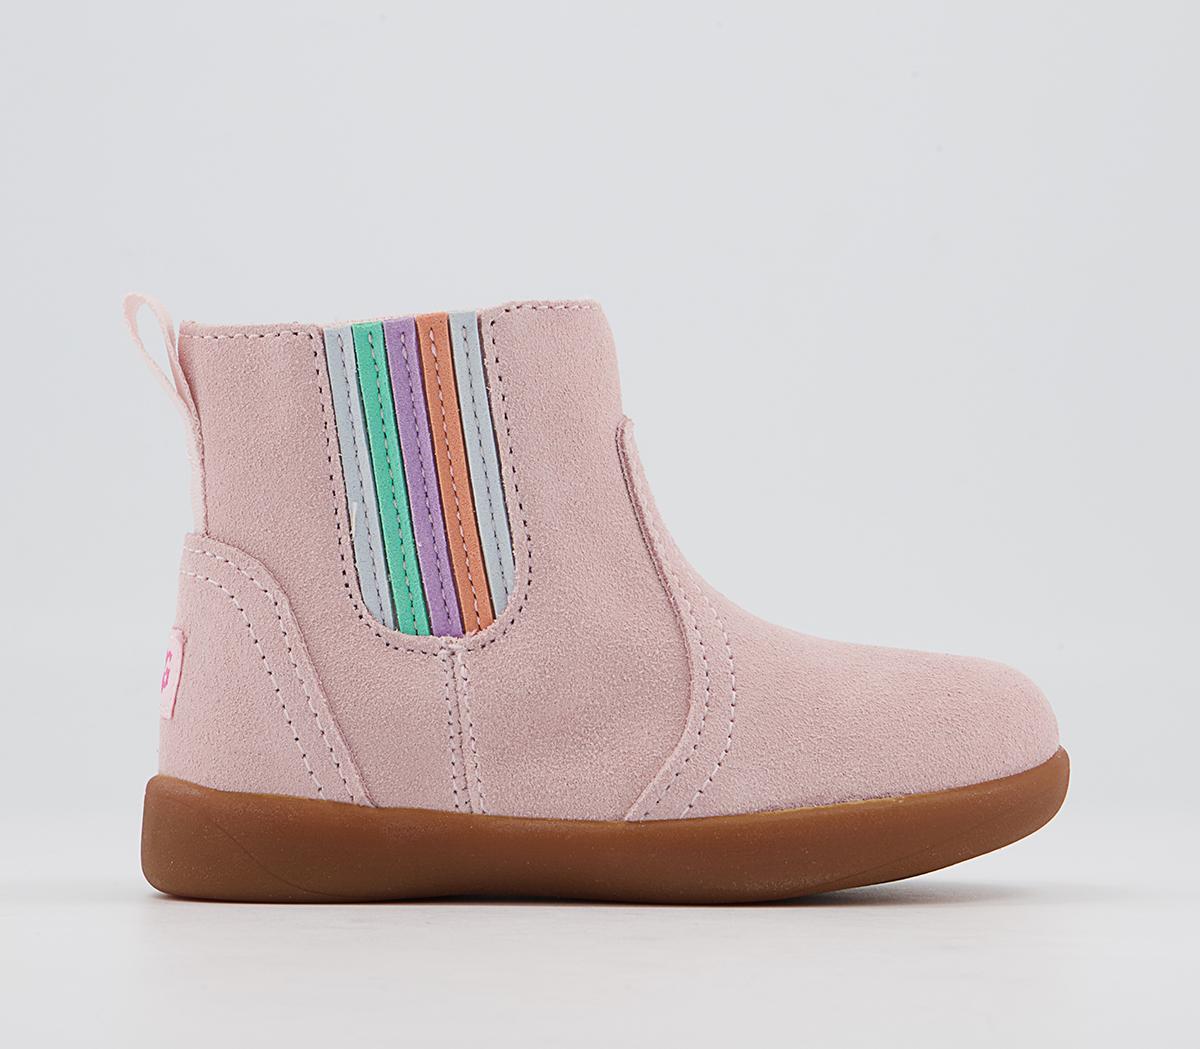 Ryndon Infant Boots